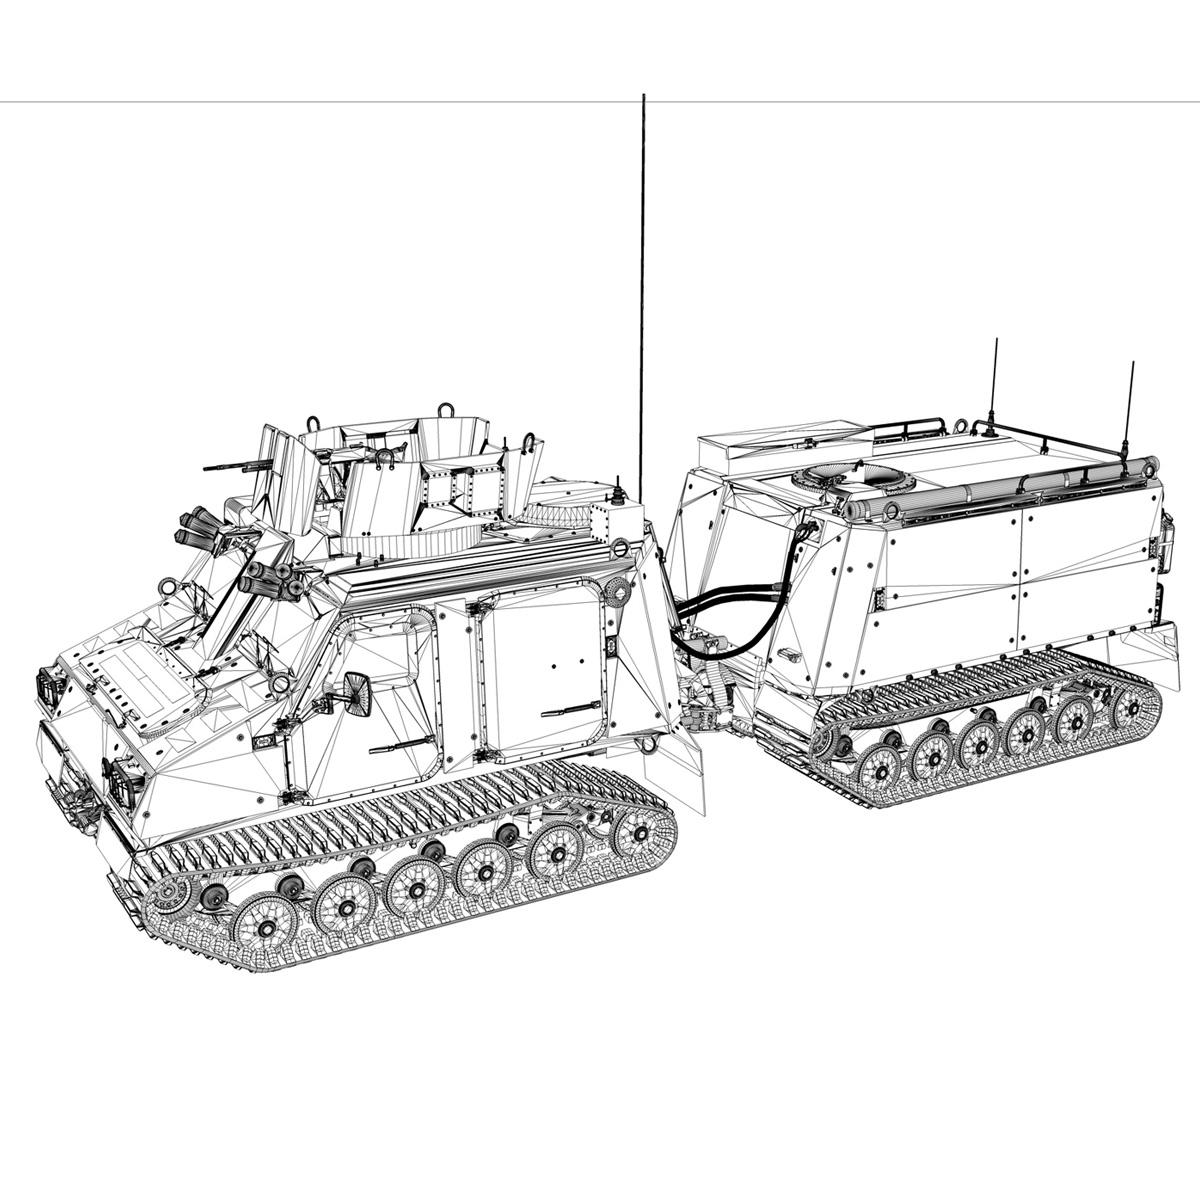 bvs10 viking – netherlands marine corps 3d model 3ds c4d lwo obj 293526